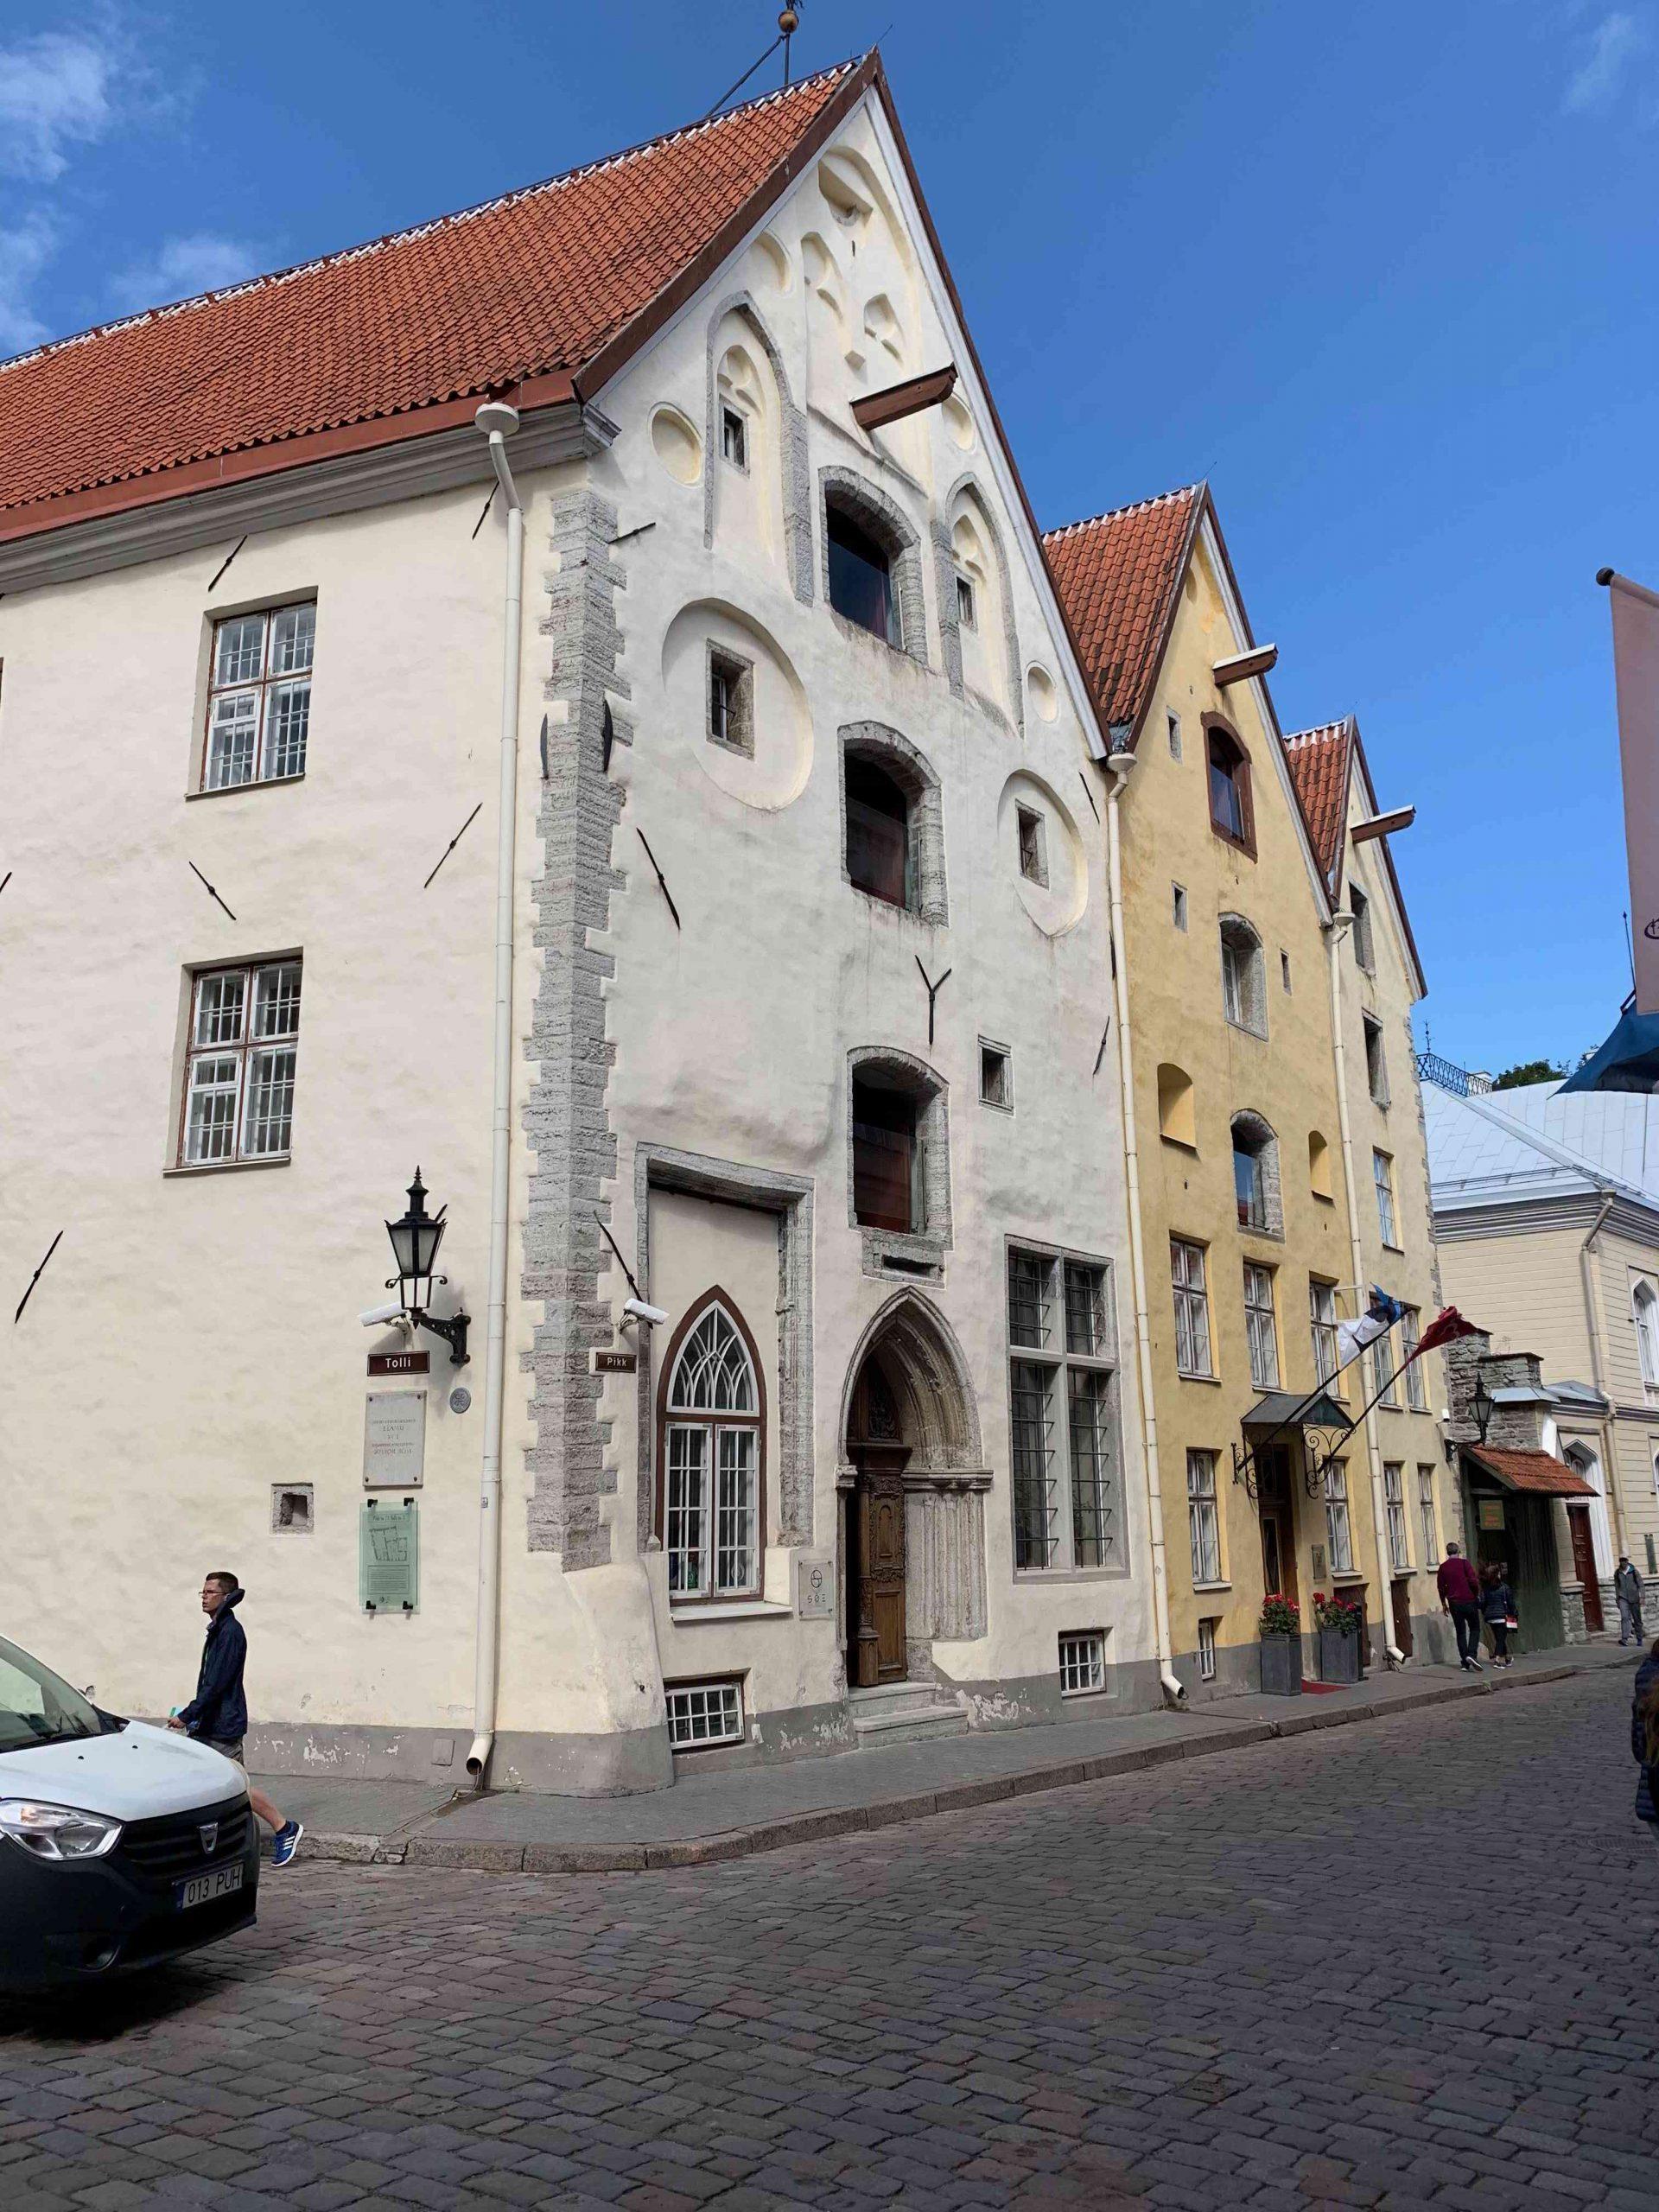 La joya medieval del Báltico